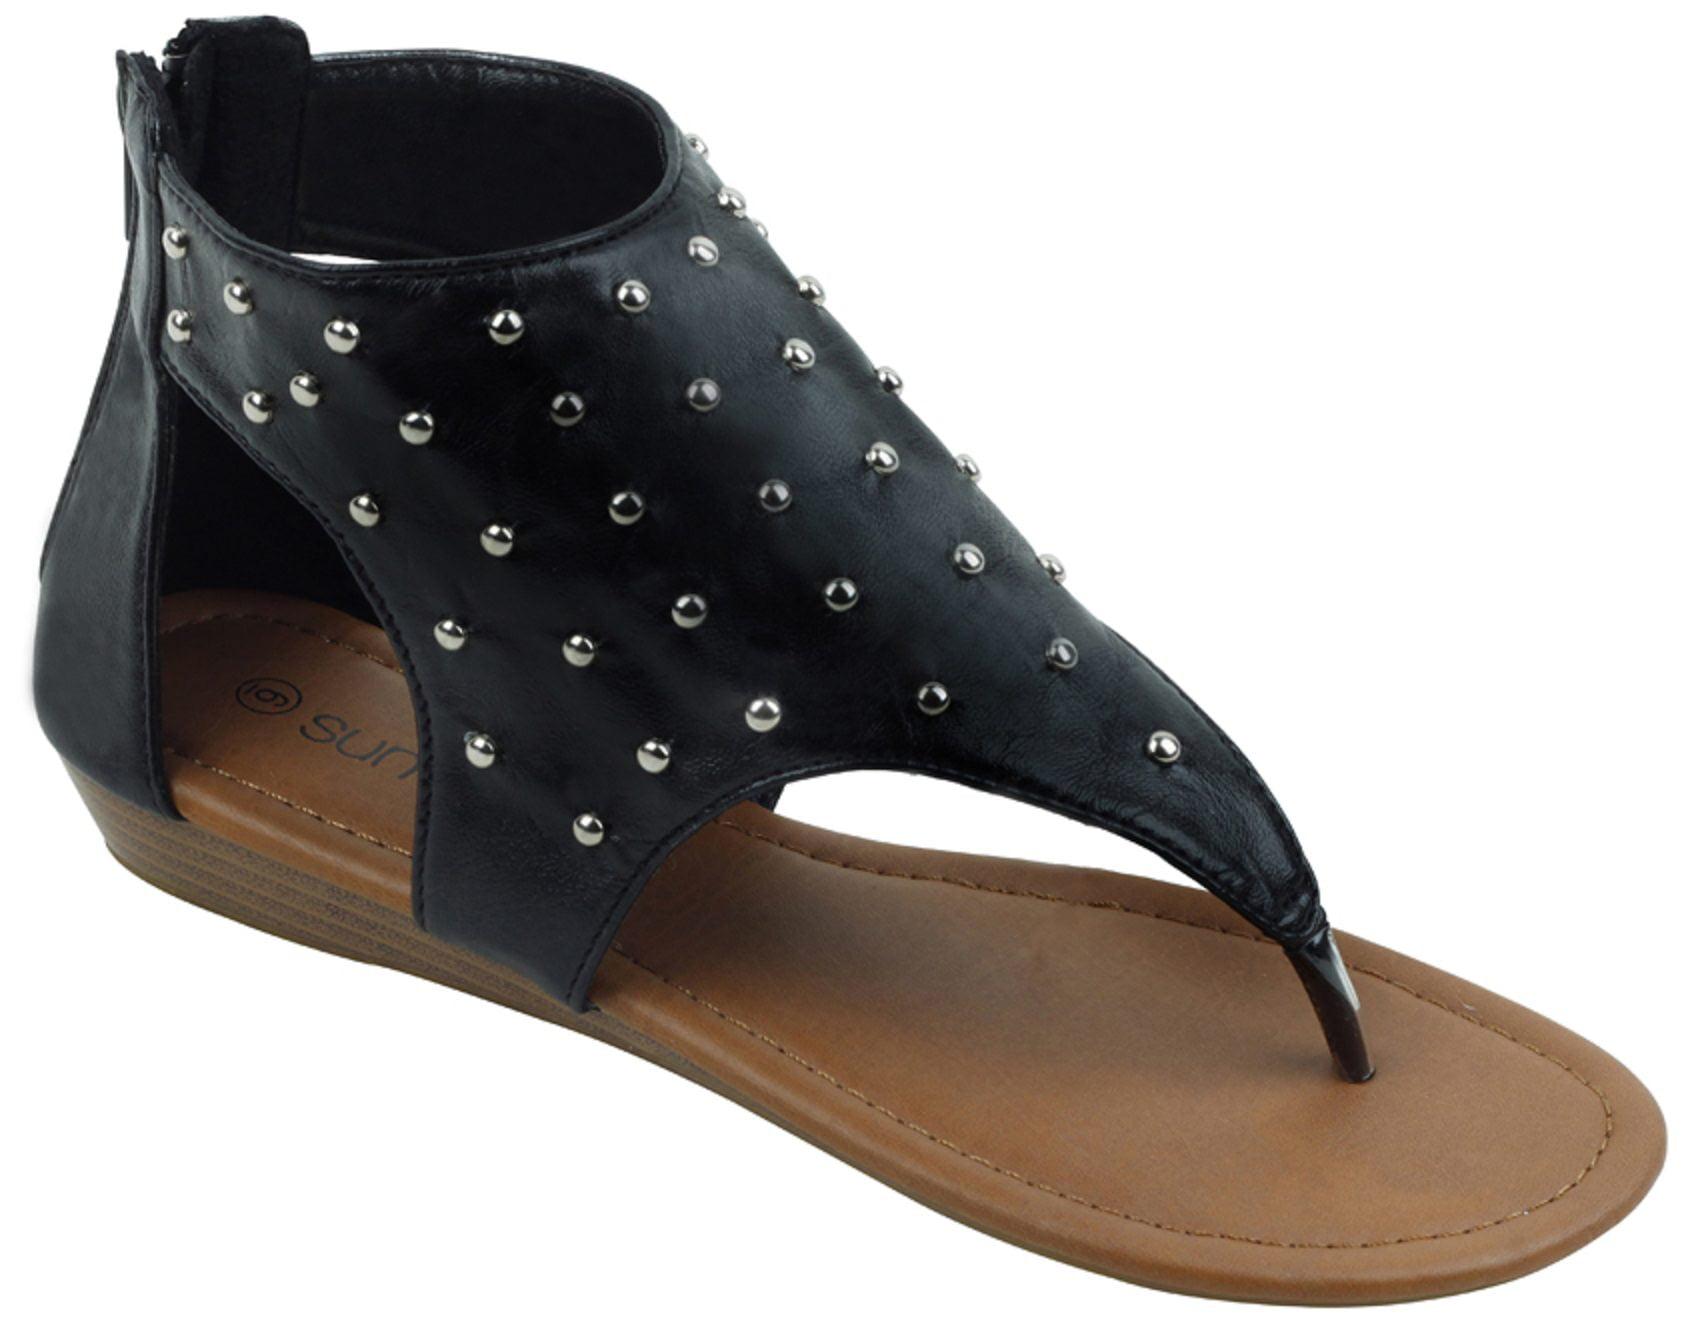 6f6b28ebd946 Womens gladiator sandals thong flops strap flip flops flats back jpg  1700x1334 Gladiator flip flops